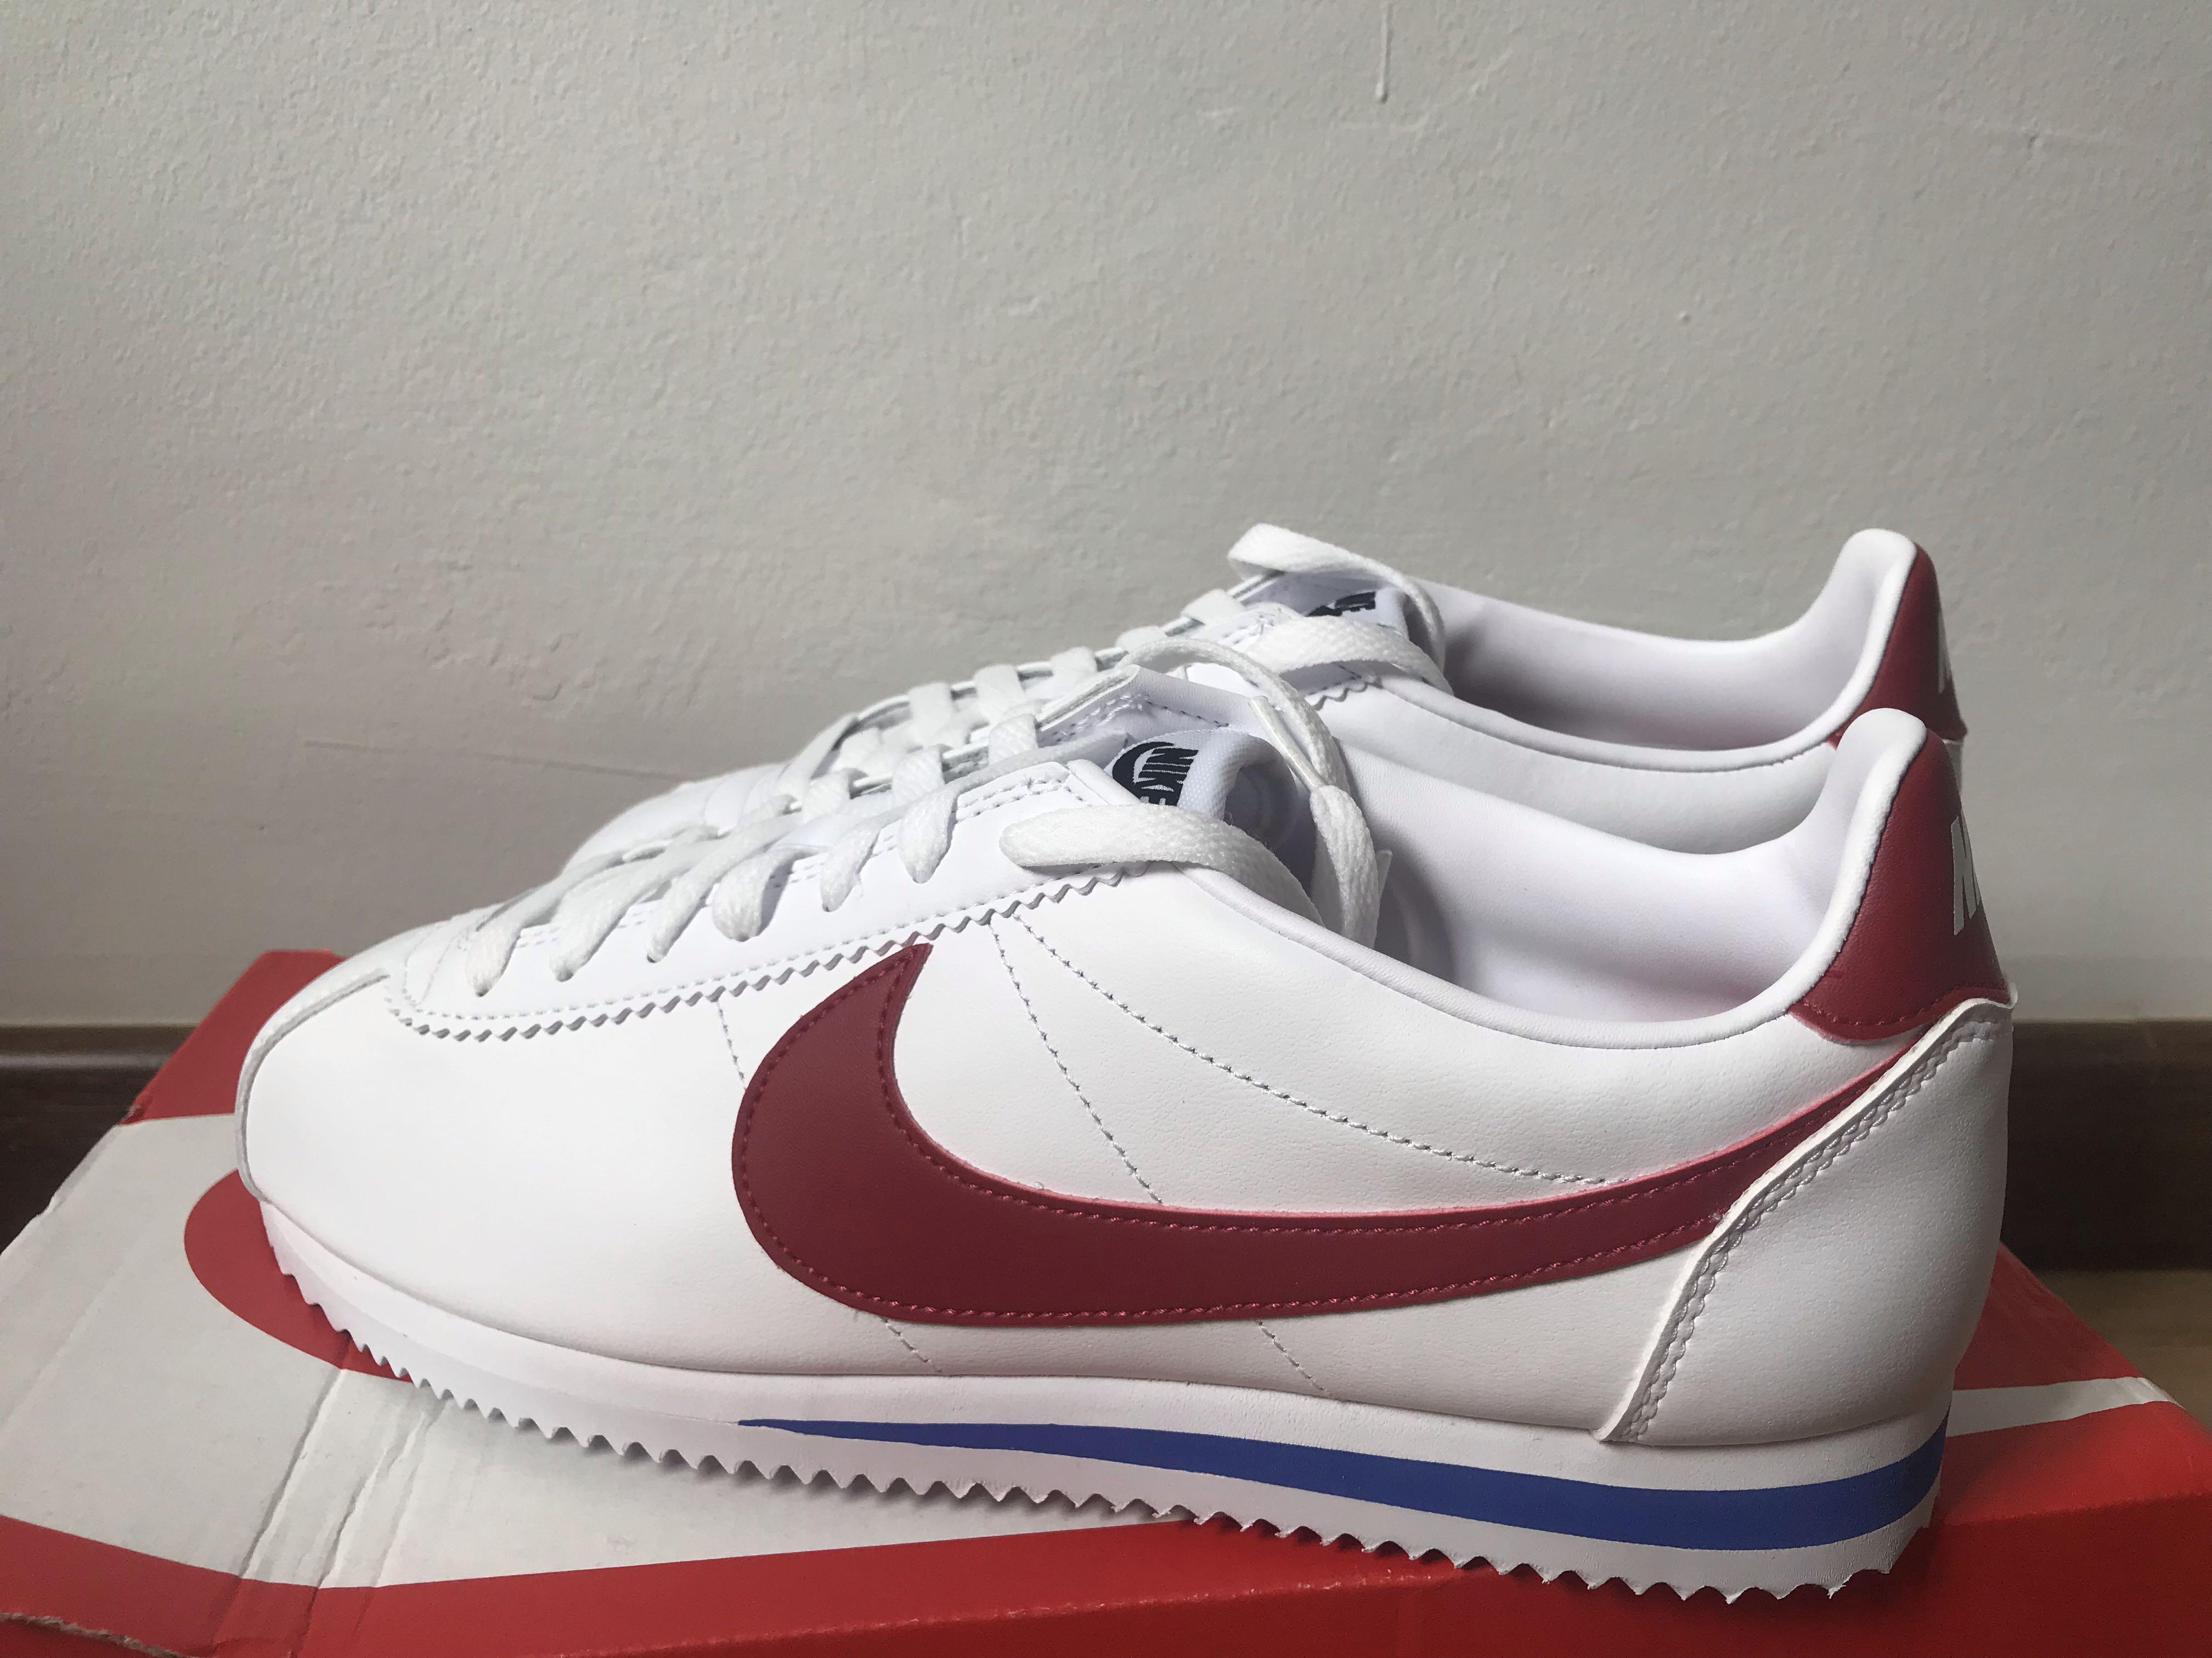 nike cortez trainers in retro leather